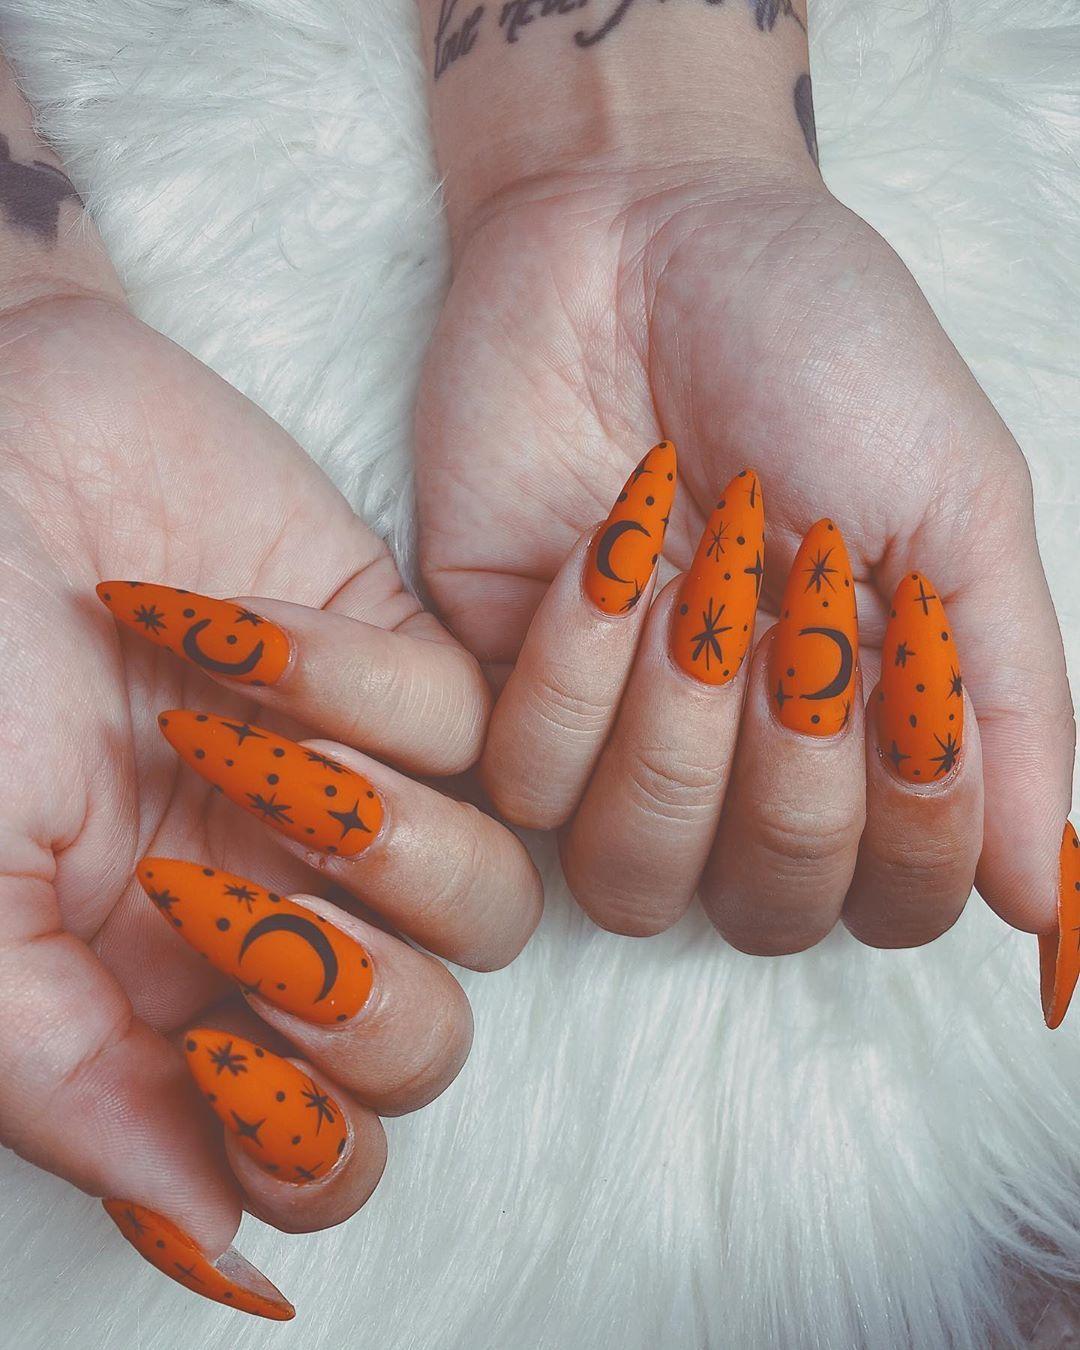 30 Striking & Spooky Halloween Nail Art Ideas